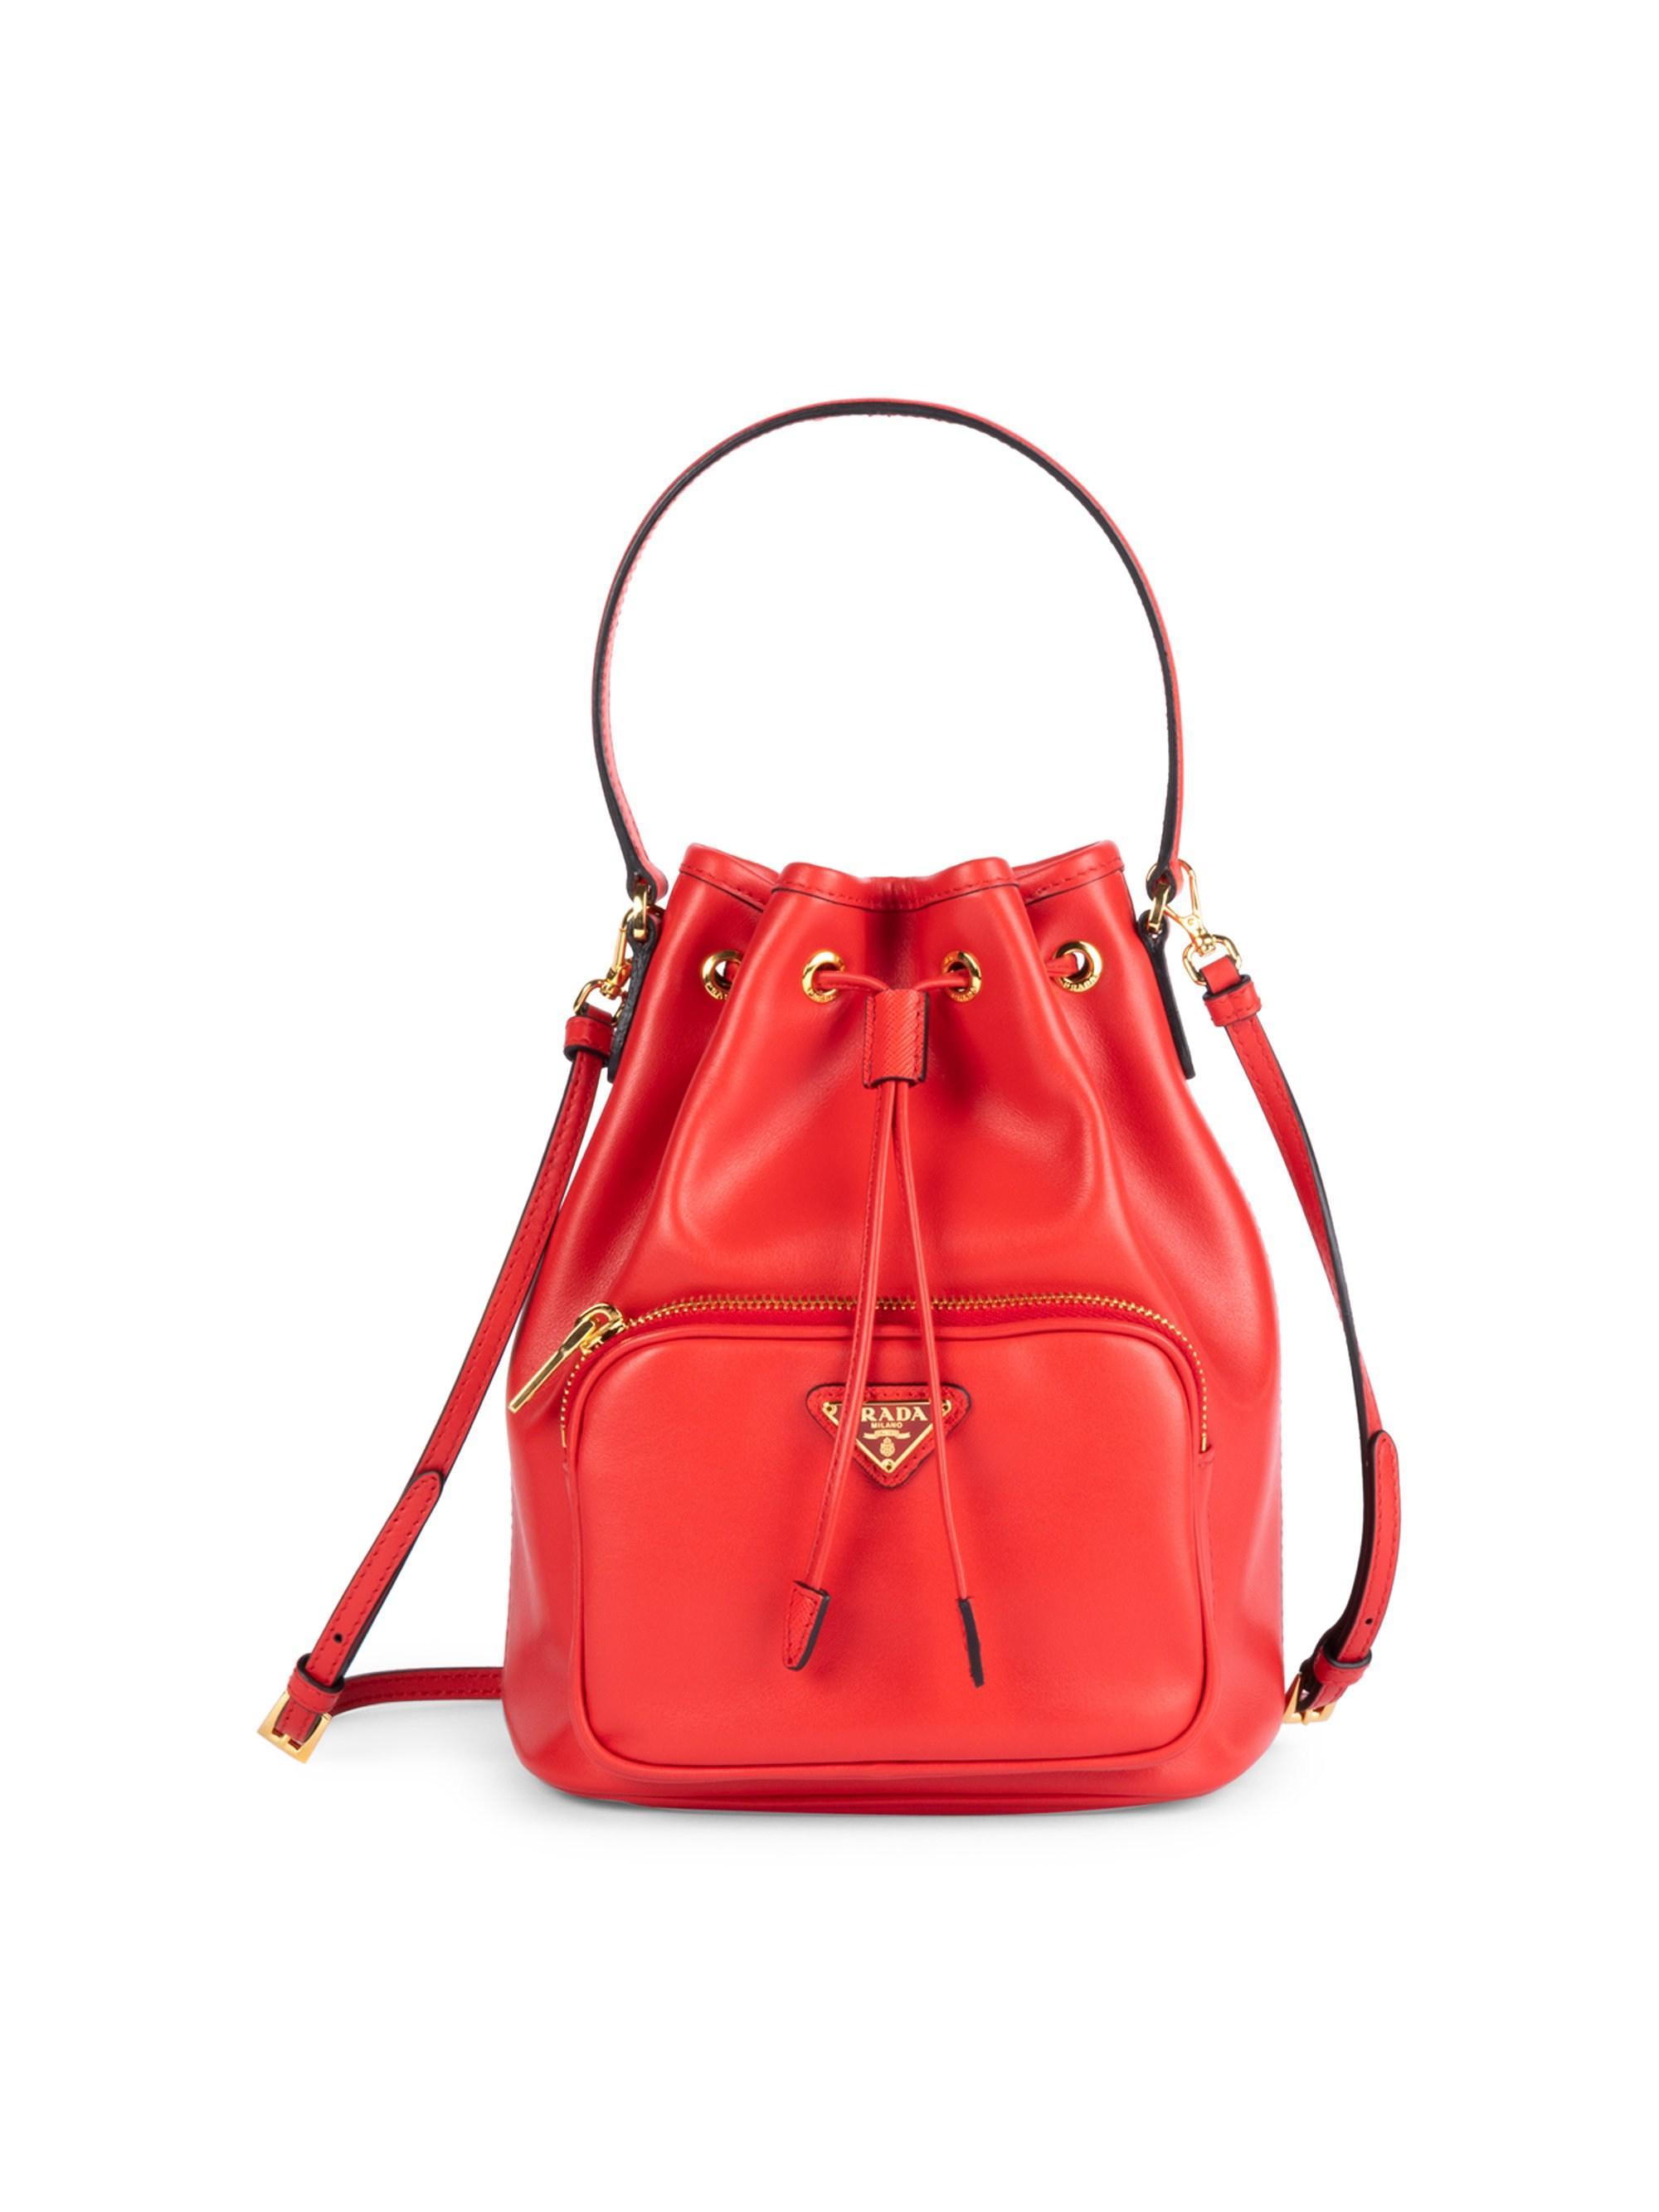 29258410c231b9 Prada Leather Bucket Bag in Red - Lyst